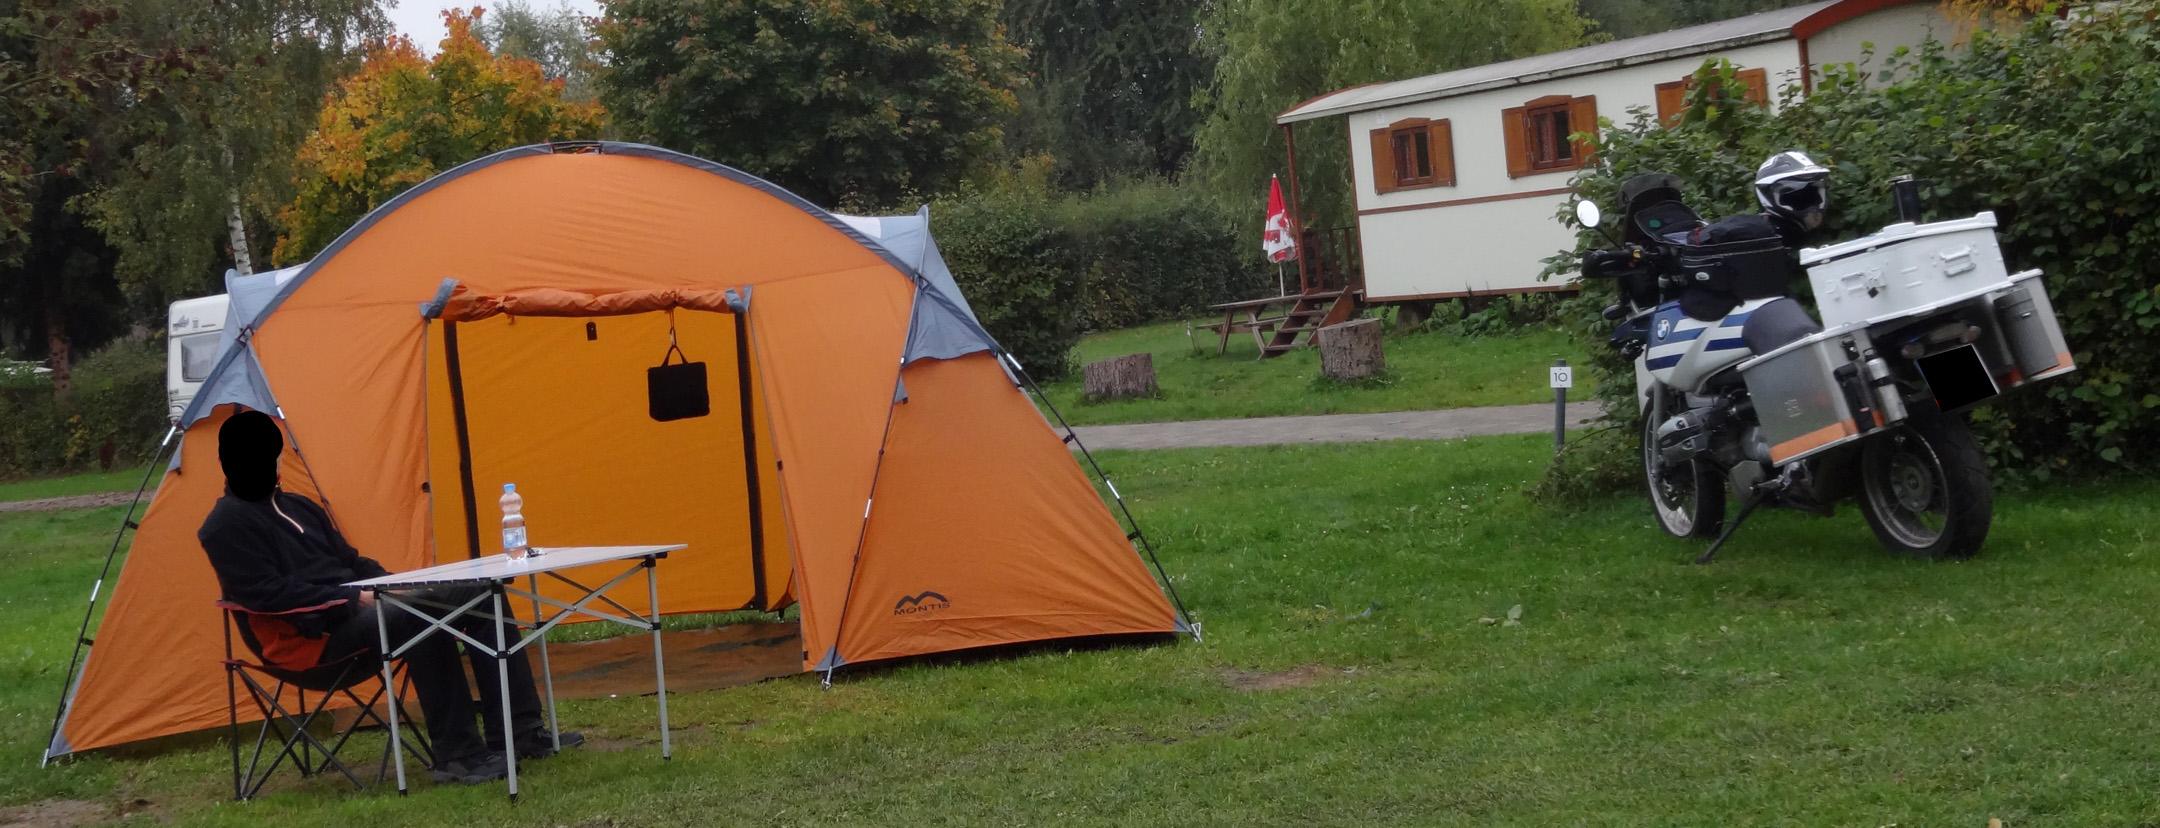 camping zubeh r seite 22. Black Bedroom Furniture Sets. Home Design Ideas